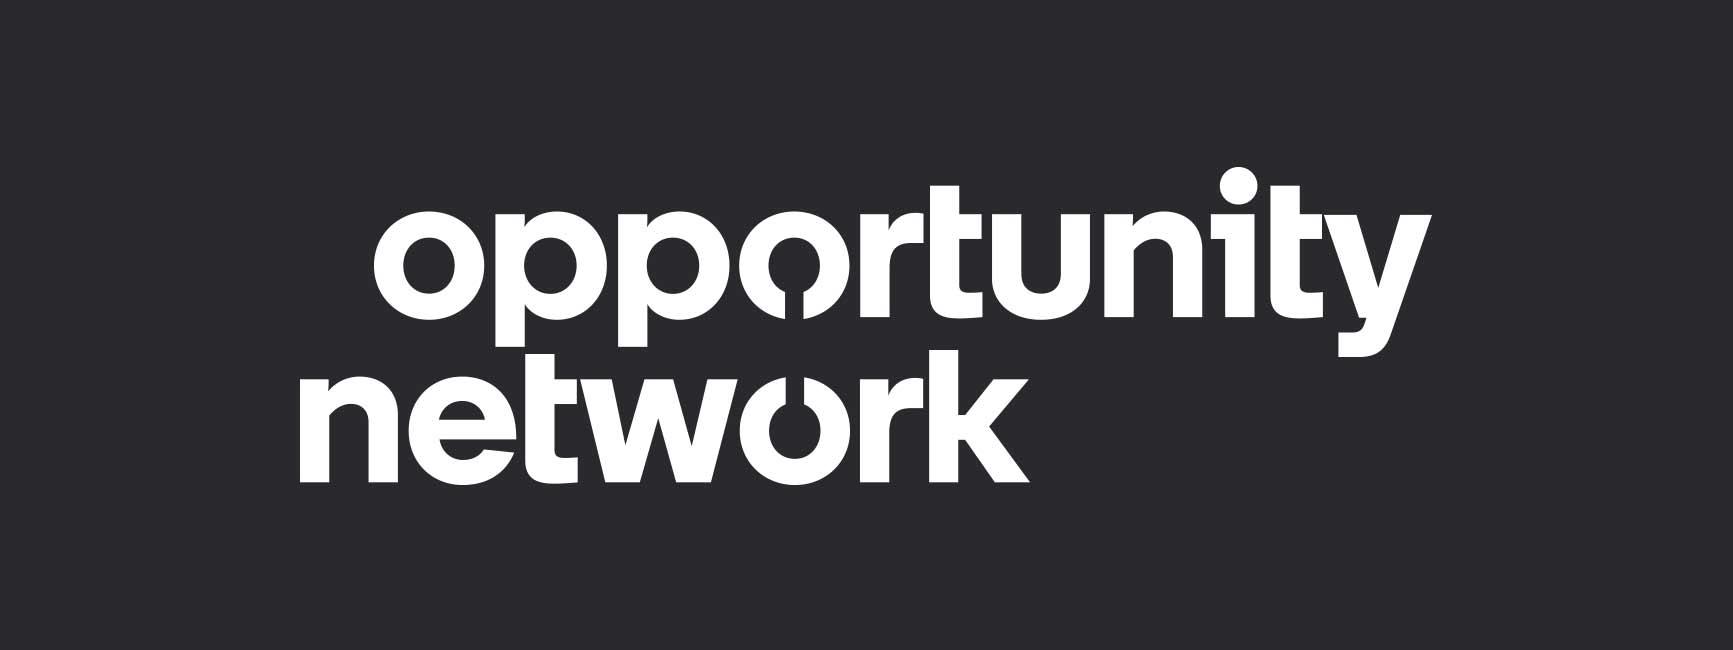 opportunity network logo